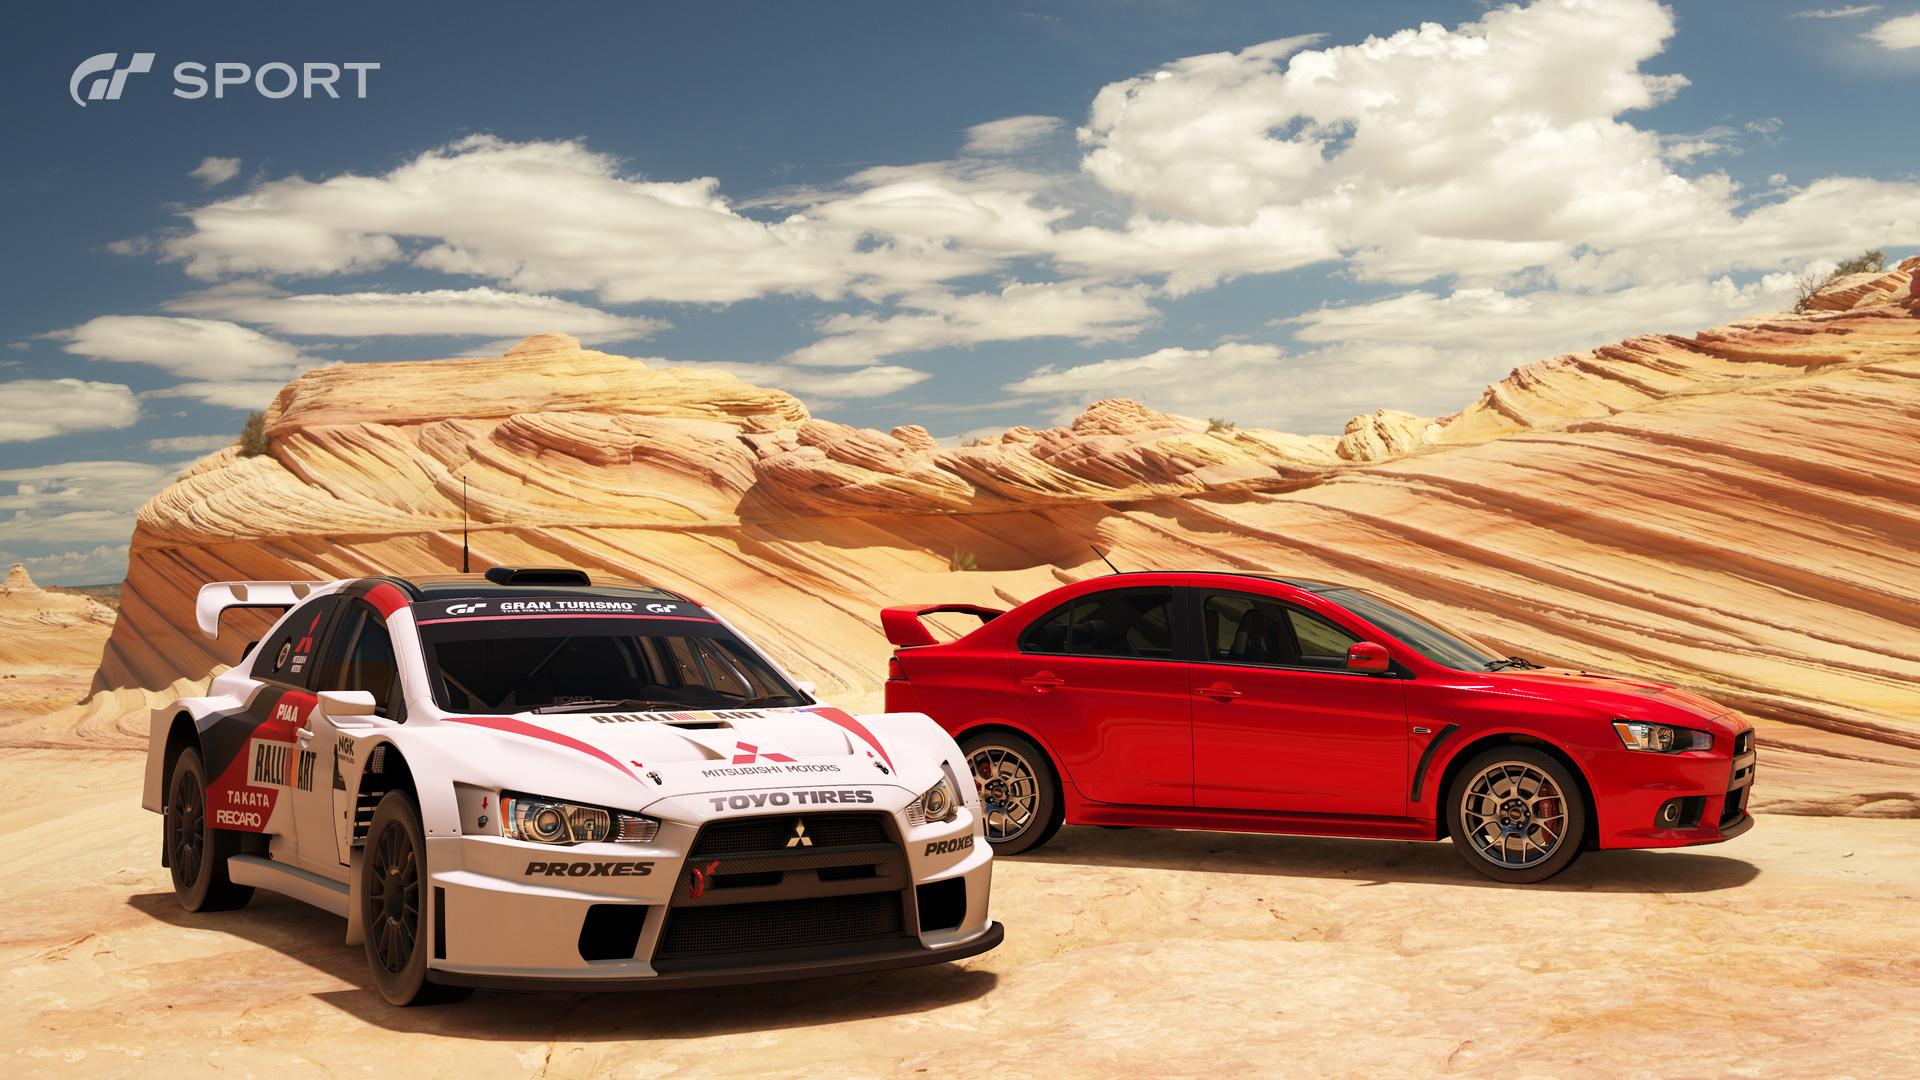 GT SPORT新聞:國際汽聯GT錦標賽預備賽季11月4日開賽